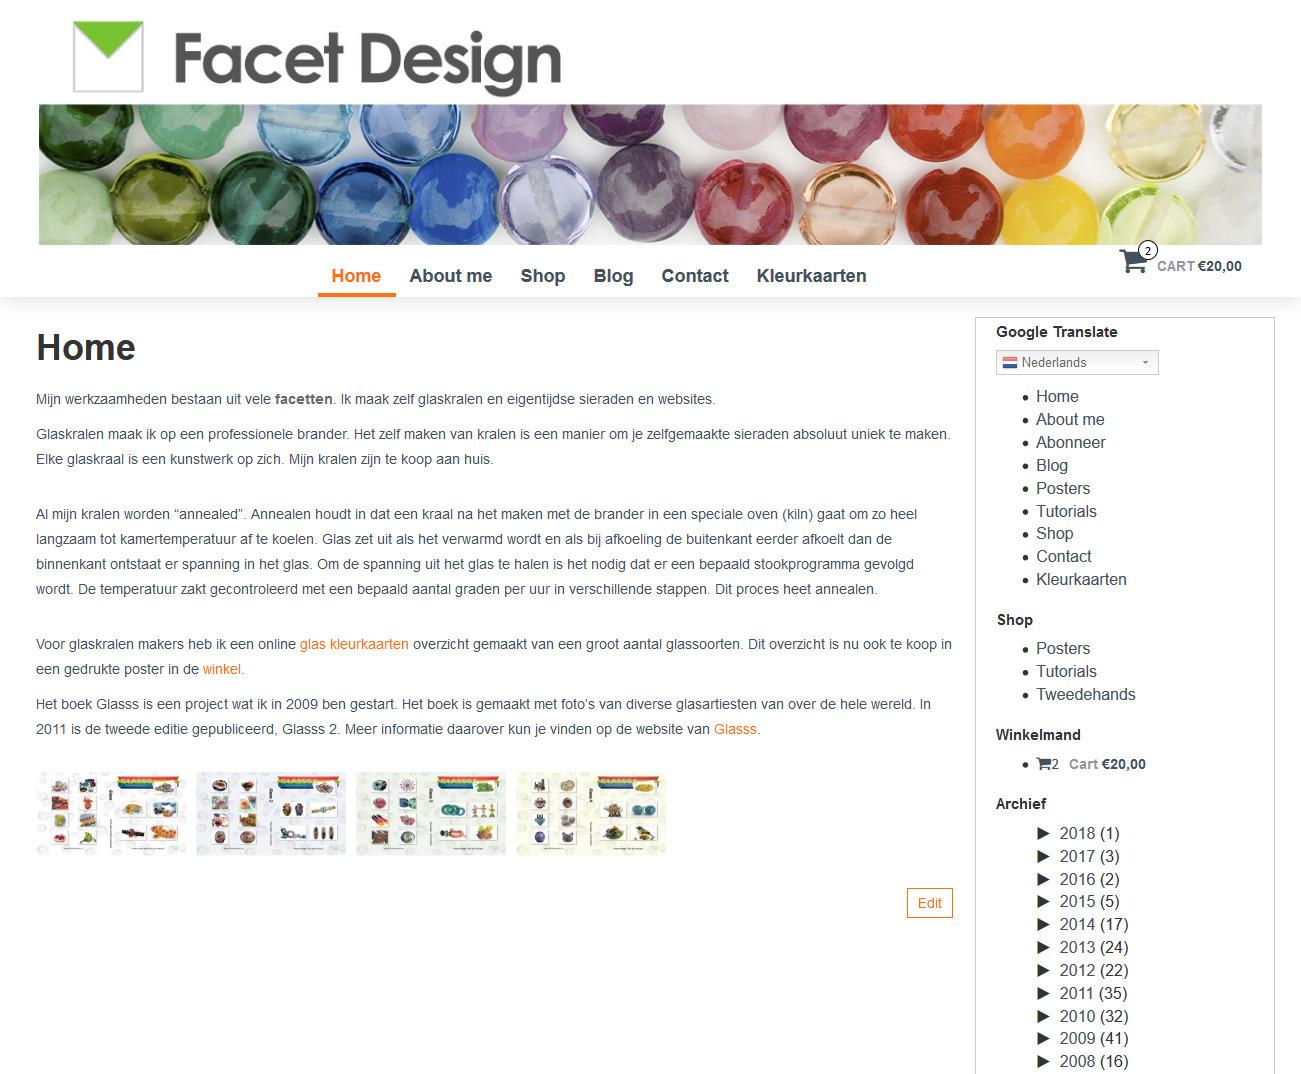 screenshot-www.facet-design.com-2019.06.09-13-50-59